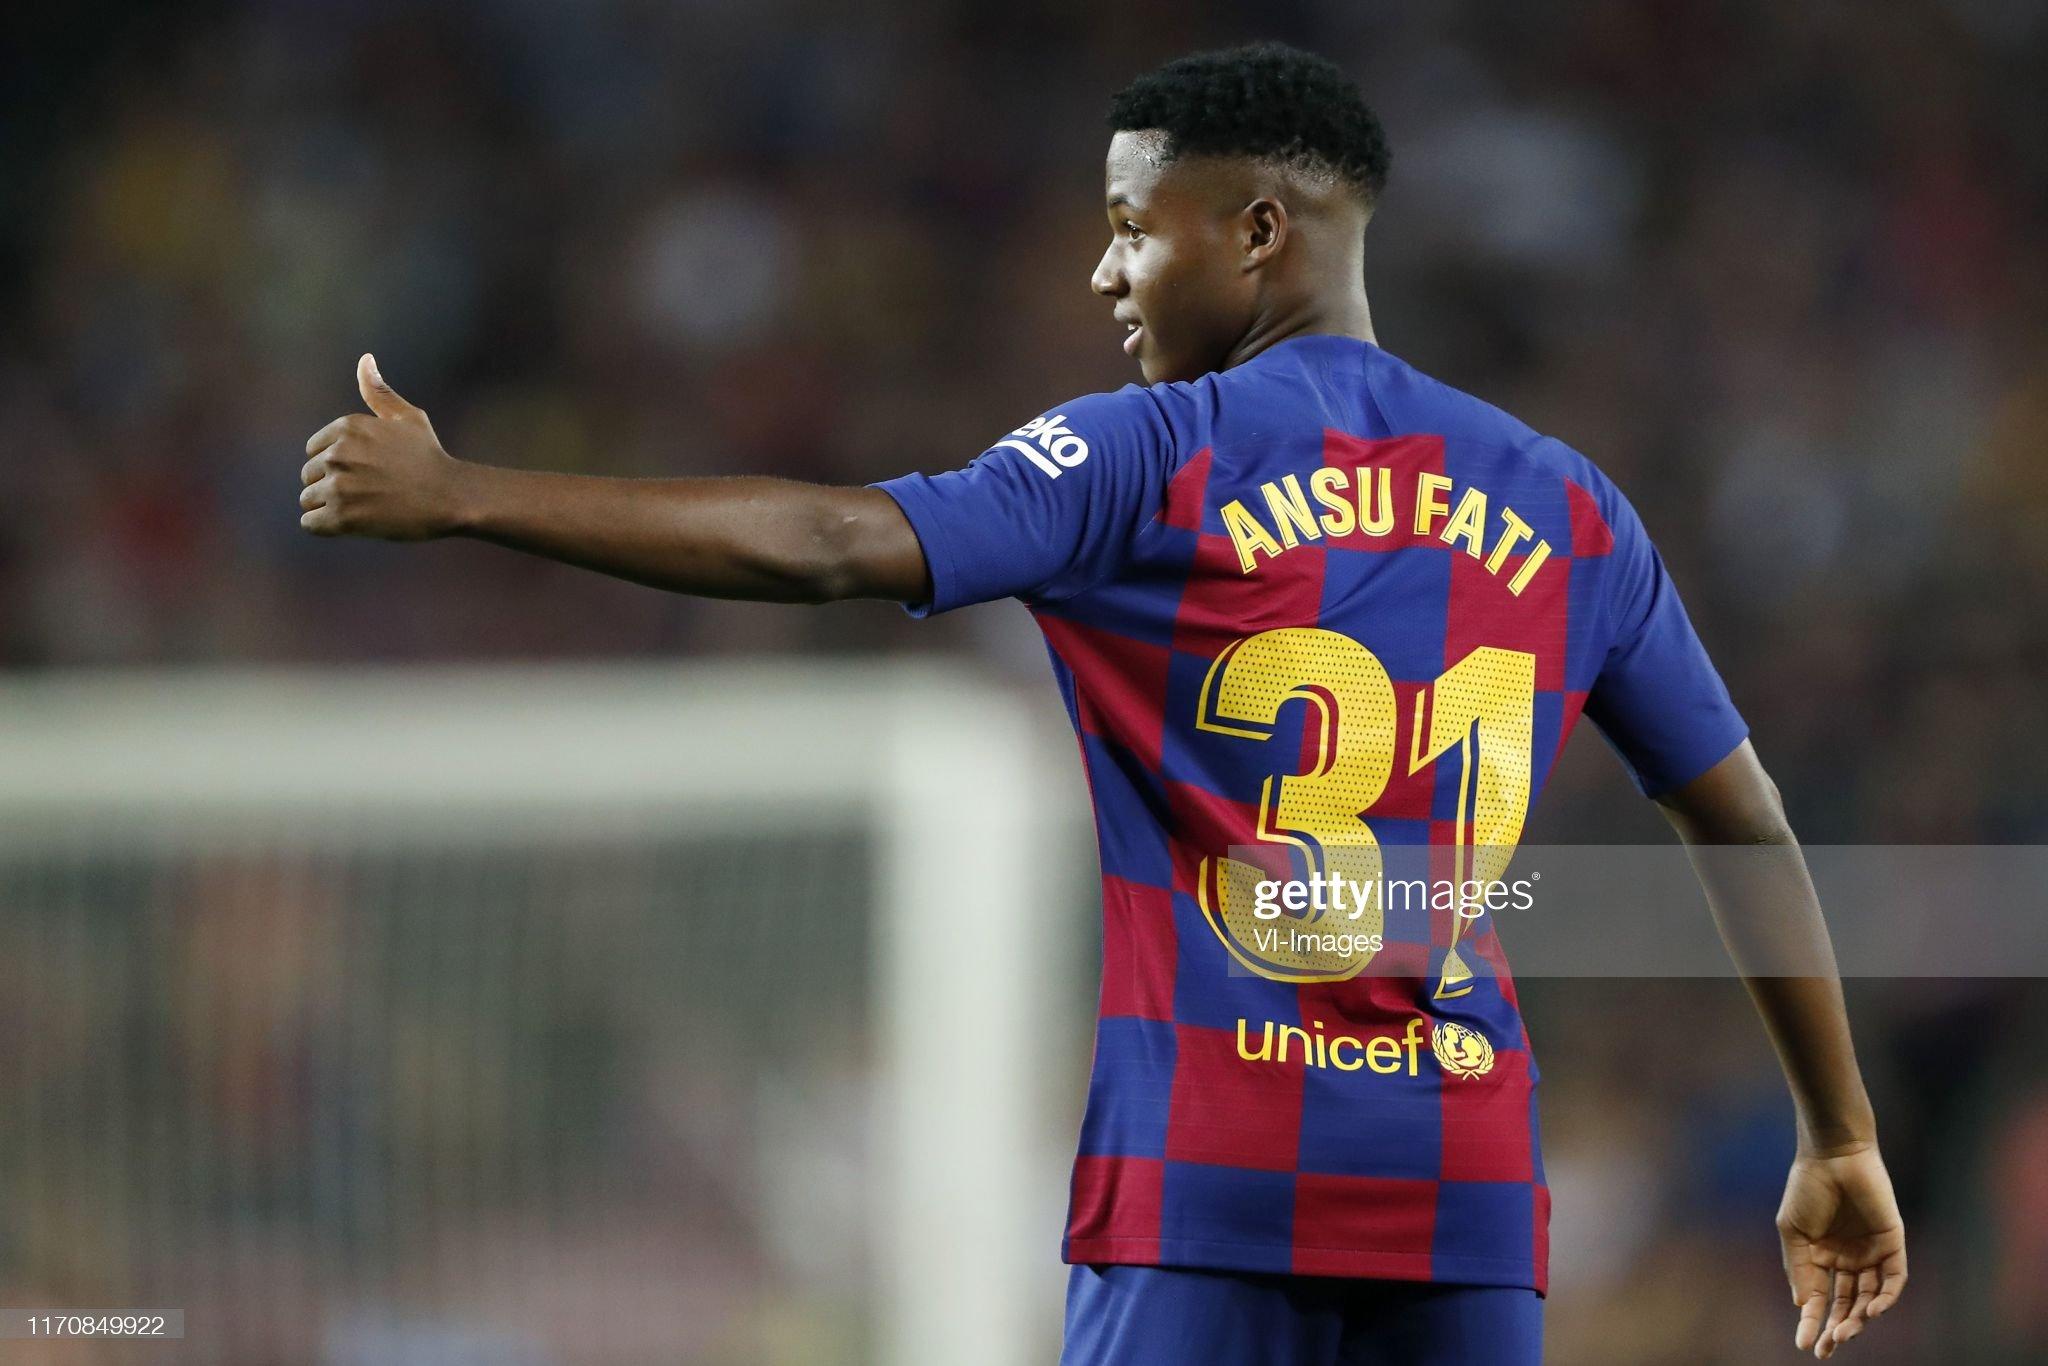 صور مباراة : برشلونة - فياريال 2-1 ( 24-09-2019 )  Ansu-fati-of-fc-barcelona-during-the-laliga-santander-match-between-picture-id1170849922?s=2048x2048